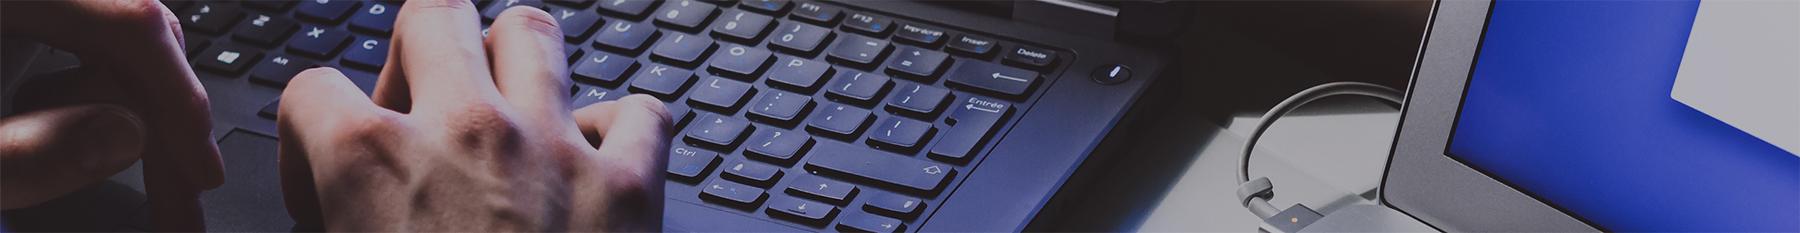 Phishing attacks are up 297% -